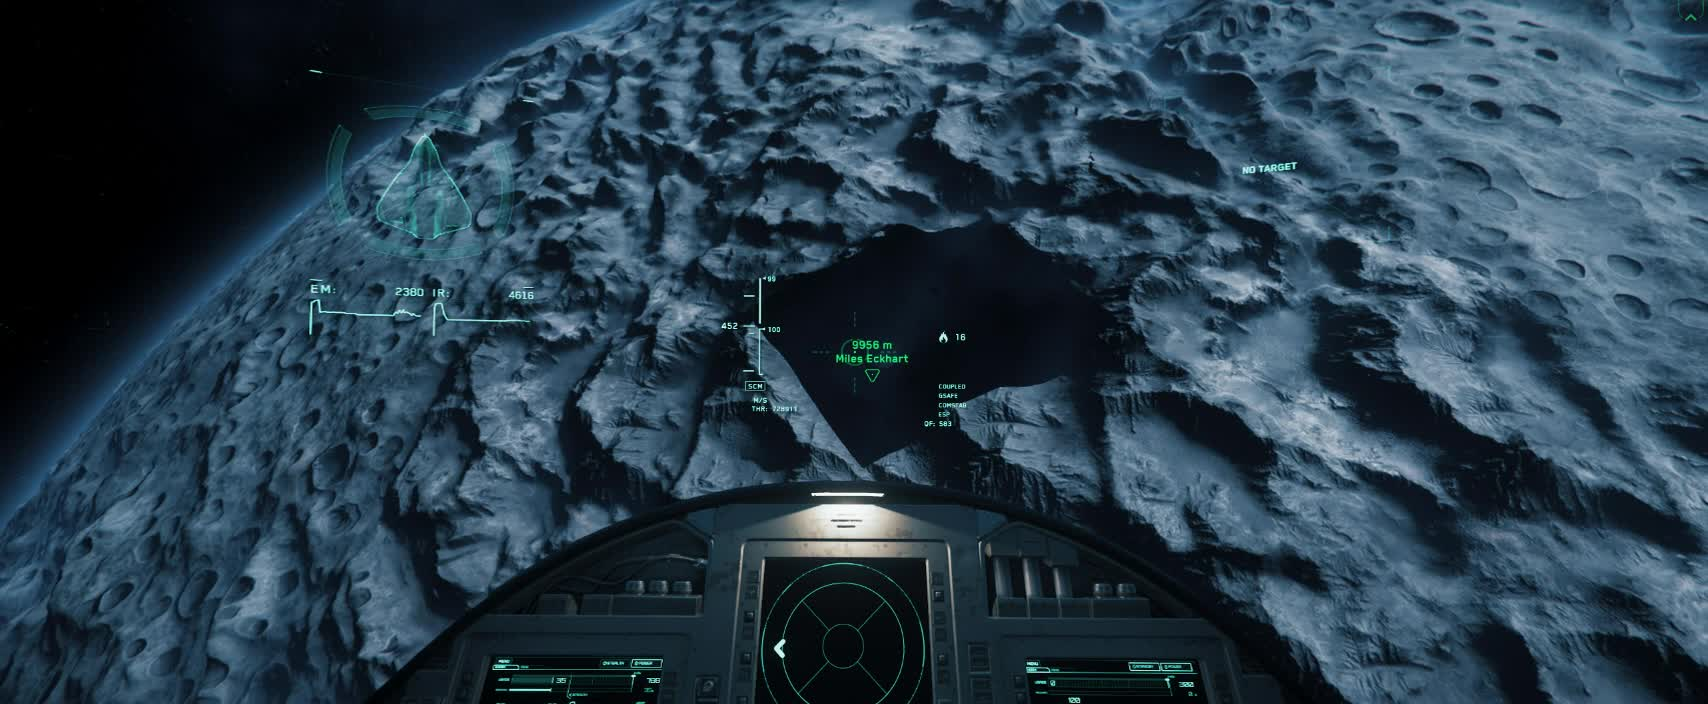 Landing, Star Citizen, Squadron 42 - Star Citizen MS GIFs